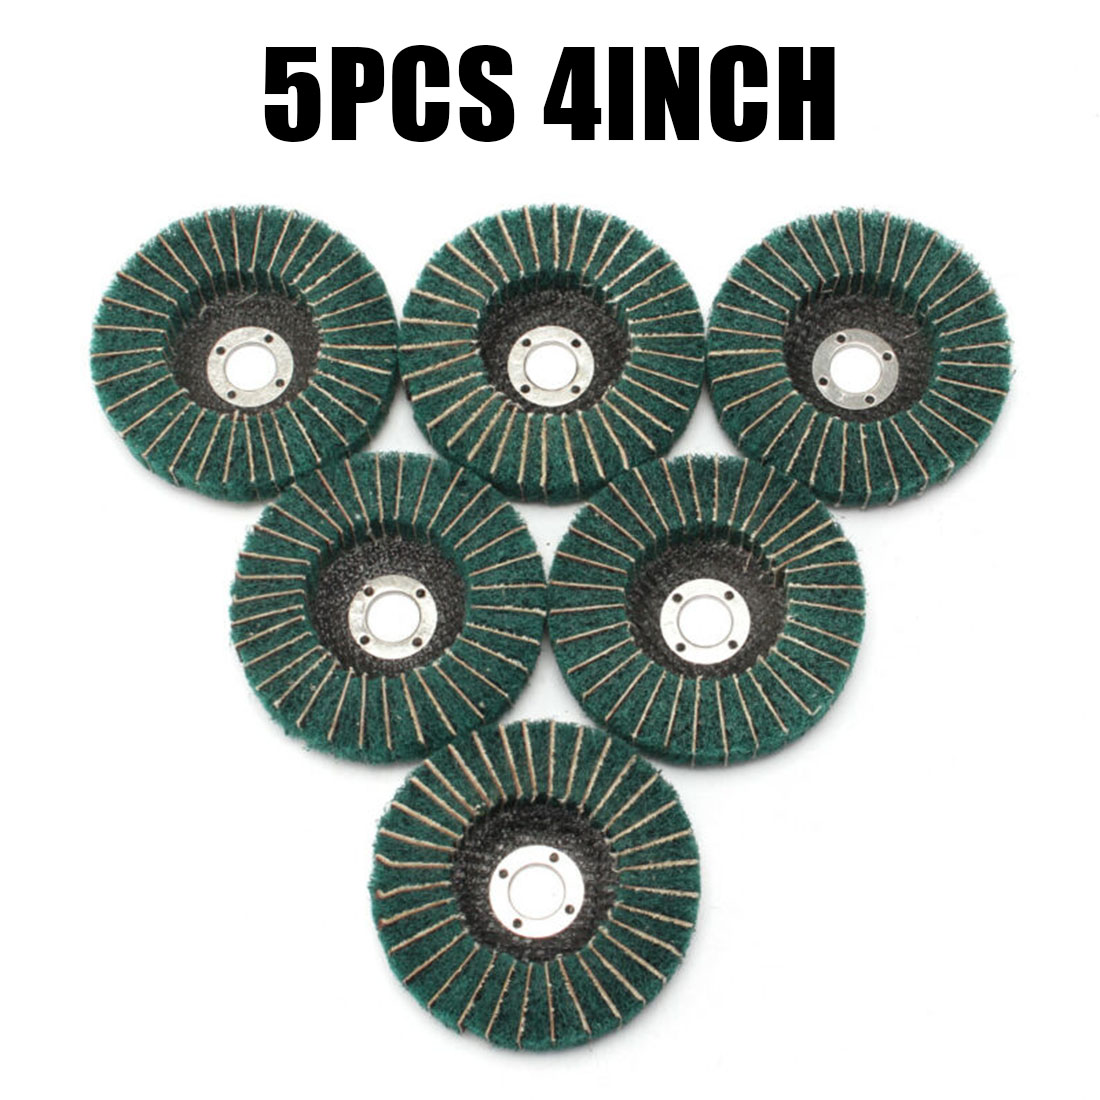 5Pcs 4inch Nylon Fiber Flap Wheel Disc 100mm Abrasive Polishing Buffing Pads High Grinding Efficiency